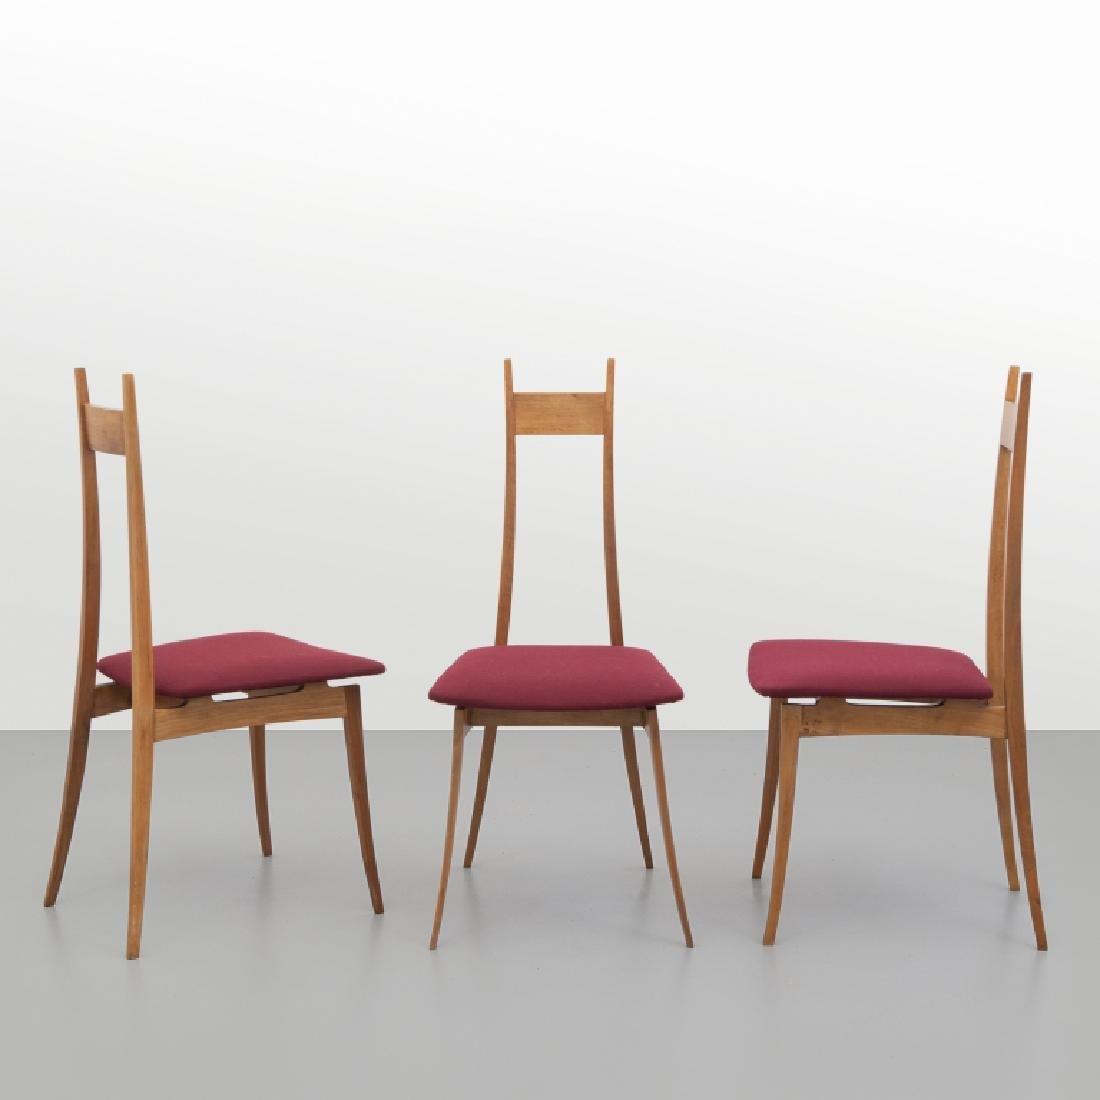 ANGELO MANGIAROTTI Tre sedie, esecuzione